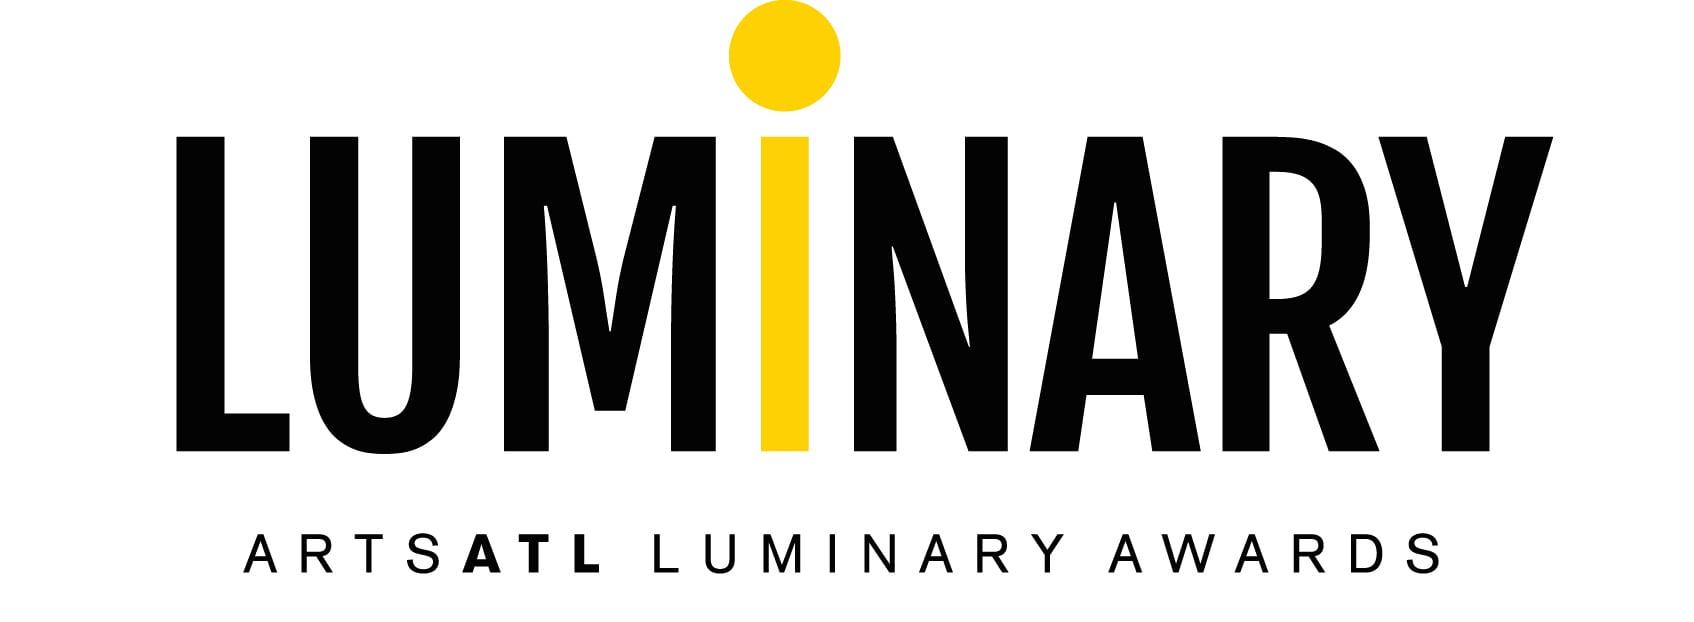 white-LUMINARY-AWARDS-LOGO_O-copy.jpeg